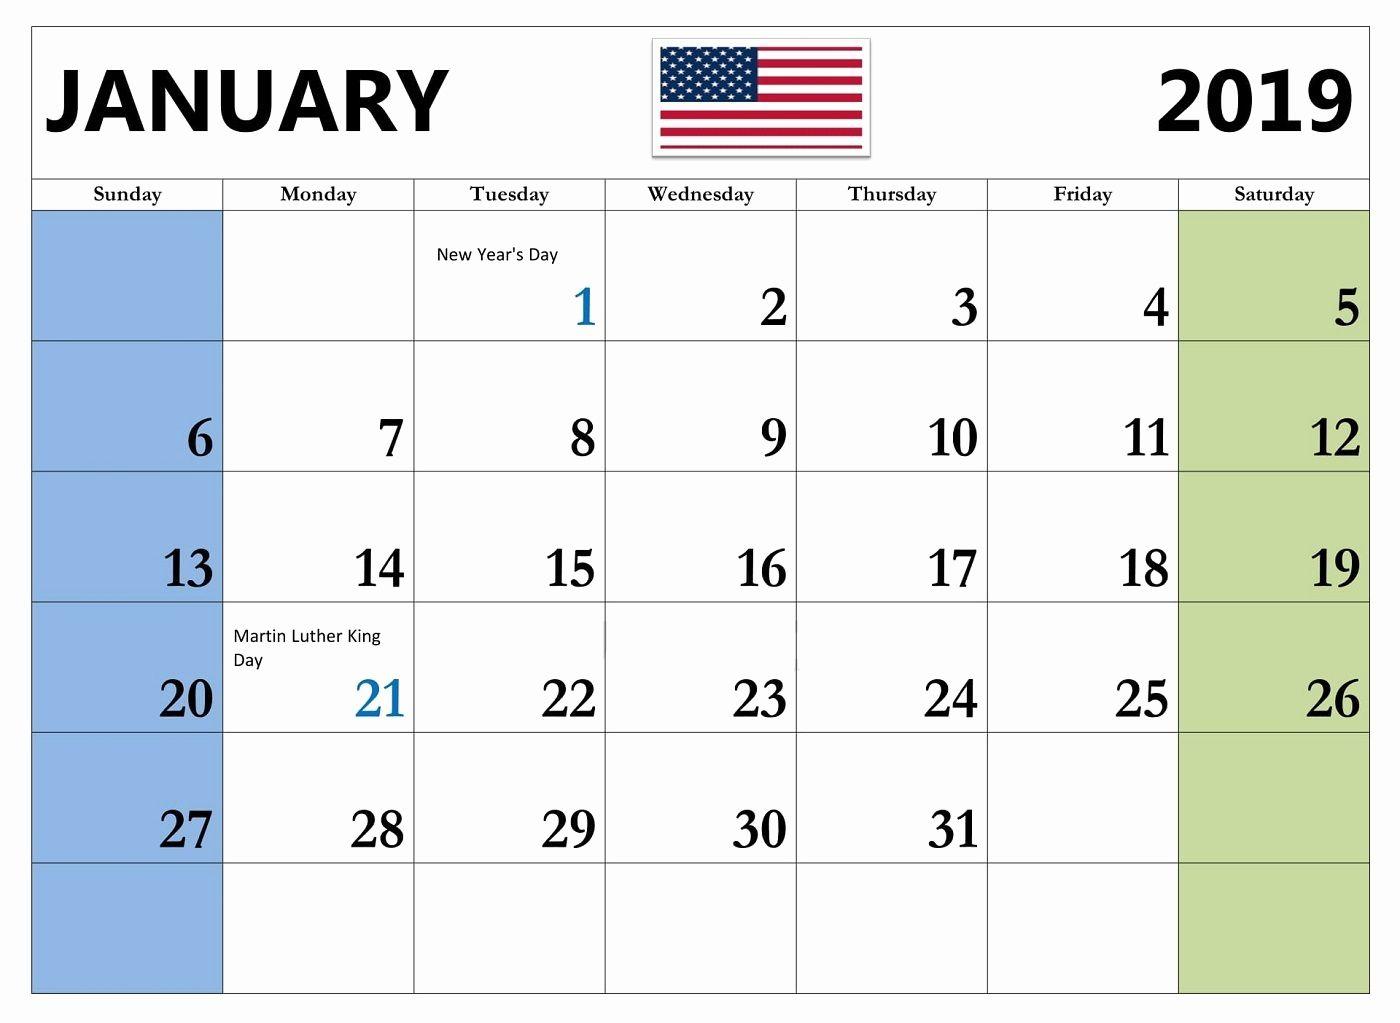 Janurary 2019 Calendar With Holidays United States Usa Printable